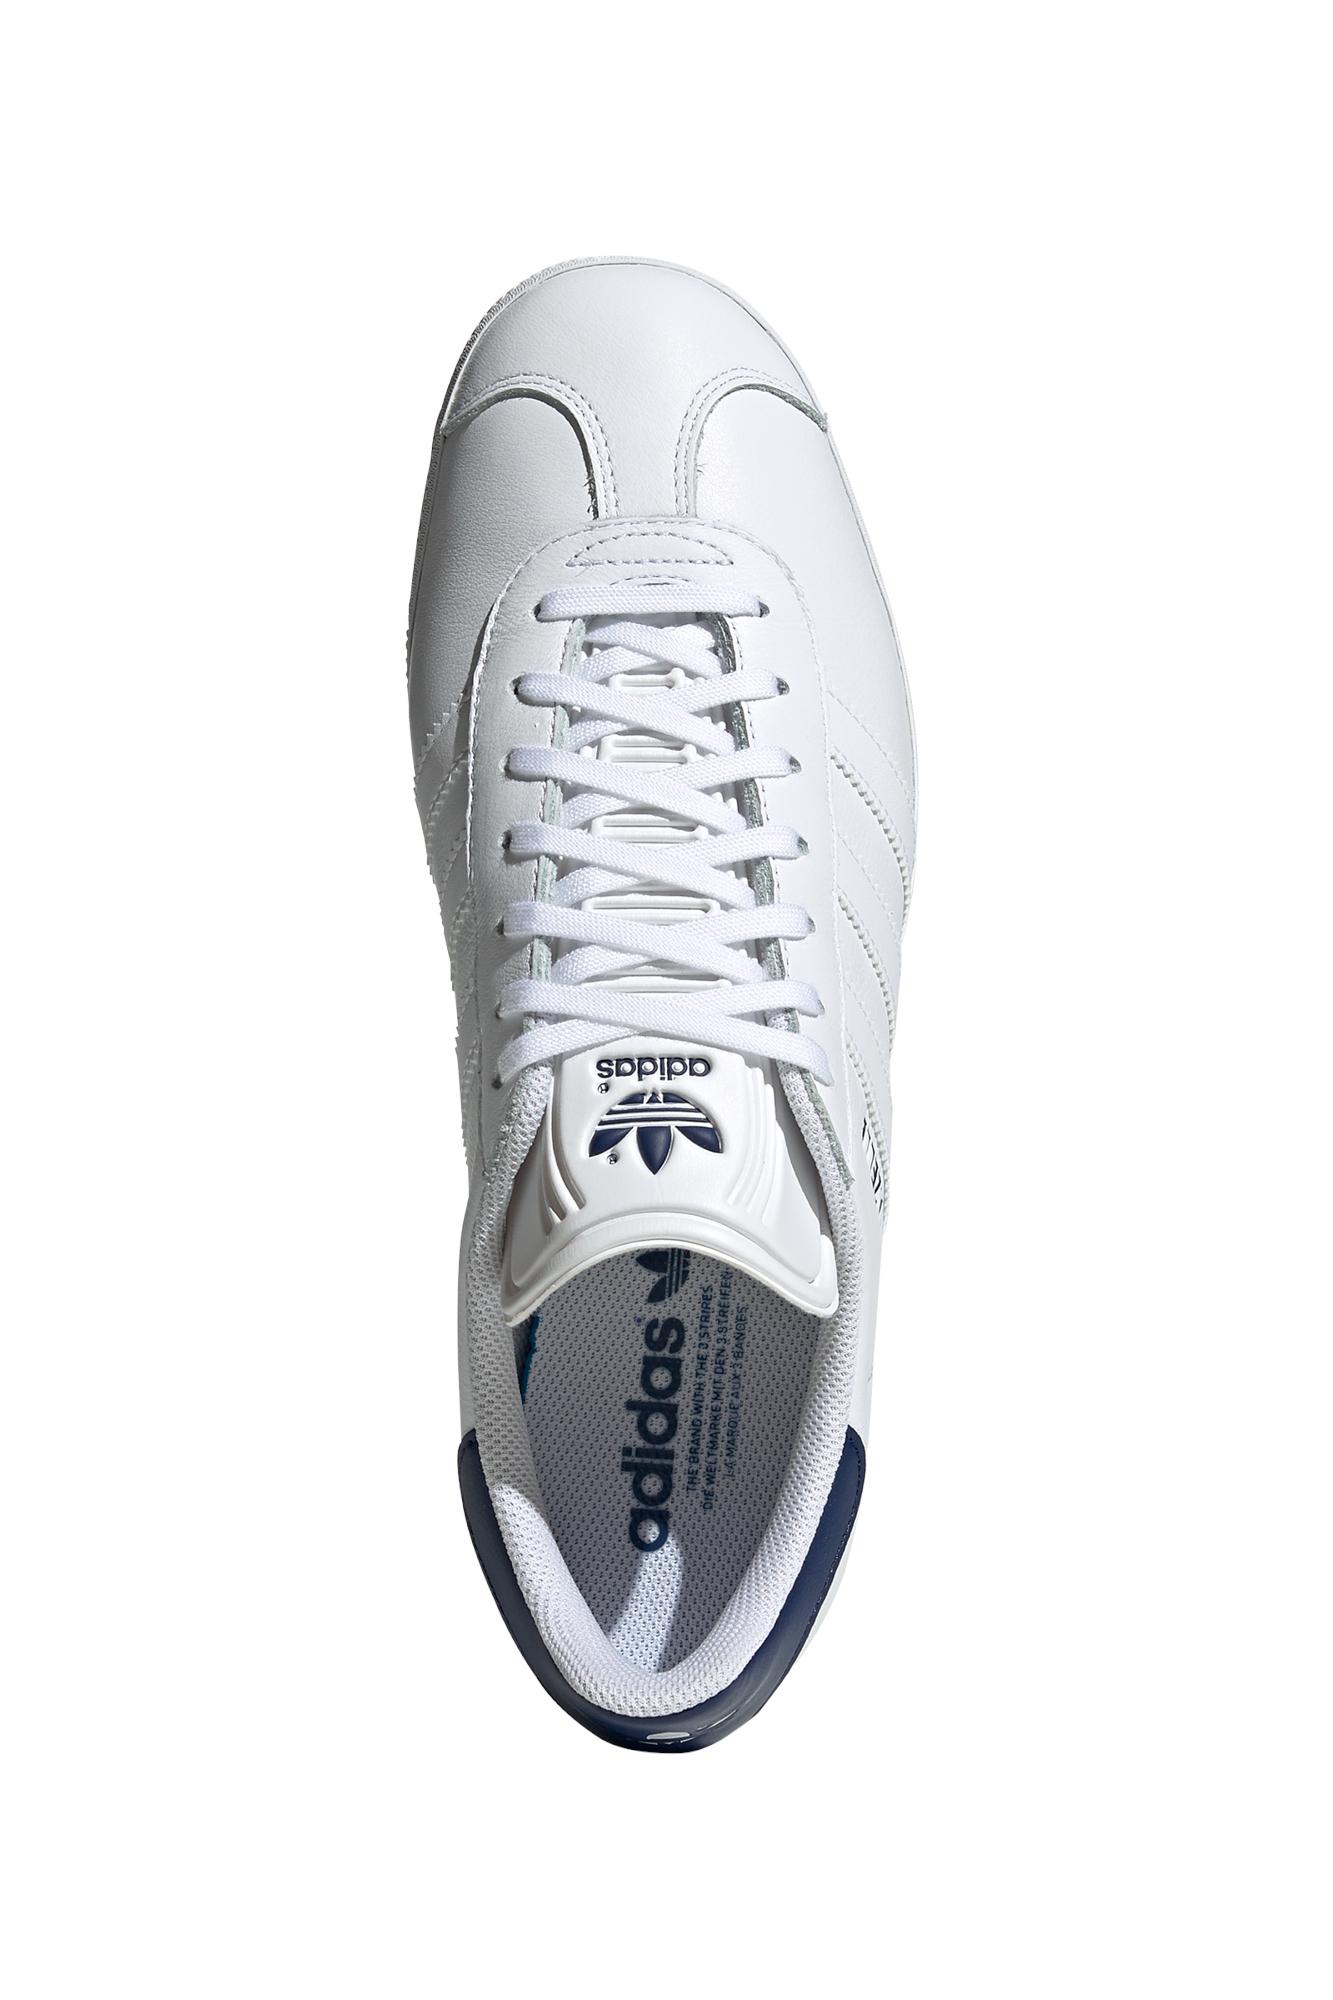 Buty Adidas Originals gazelle > fu9487